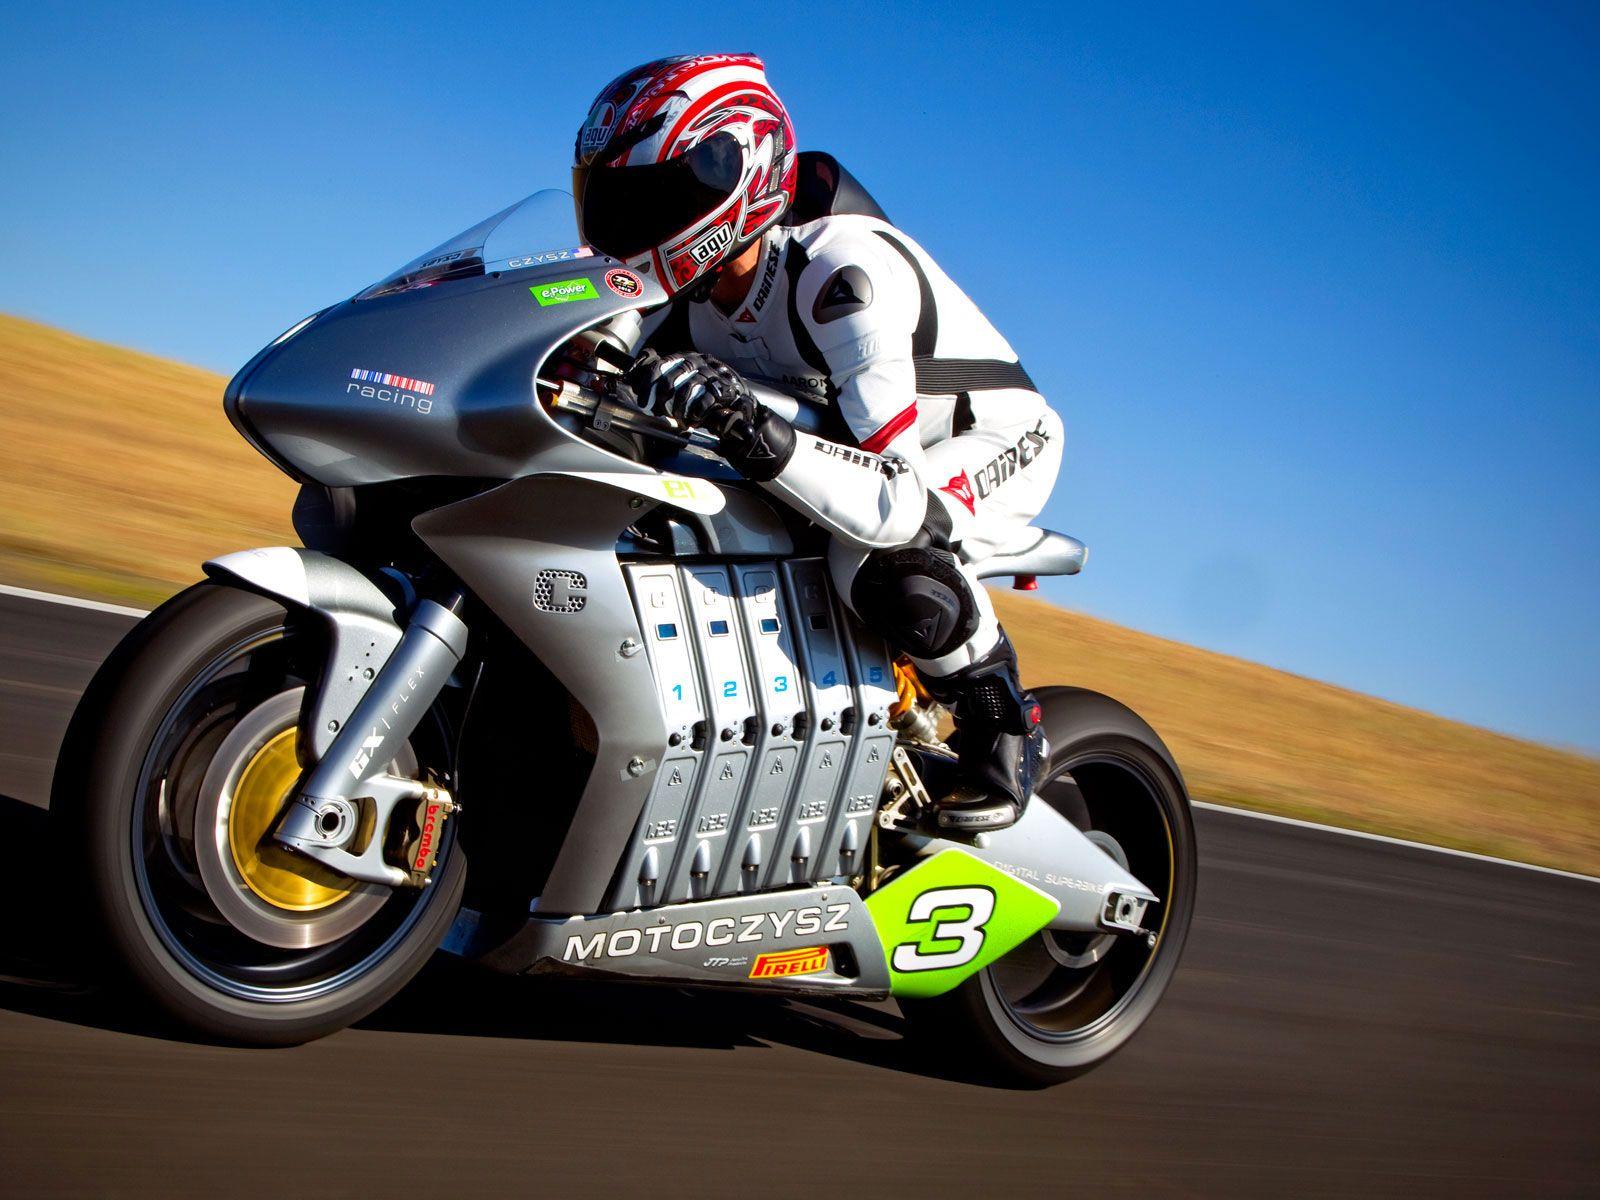 MotoCzysz Racing Bike Wallpapers HD Wallpapers 1600x1200